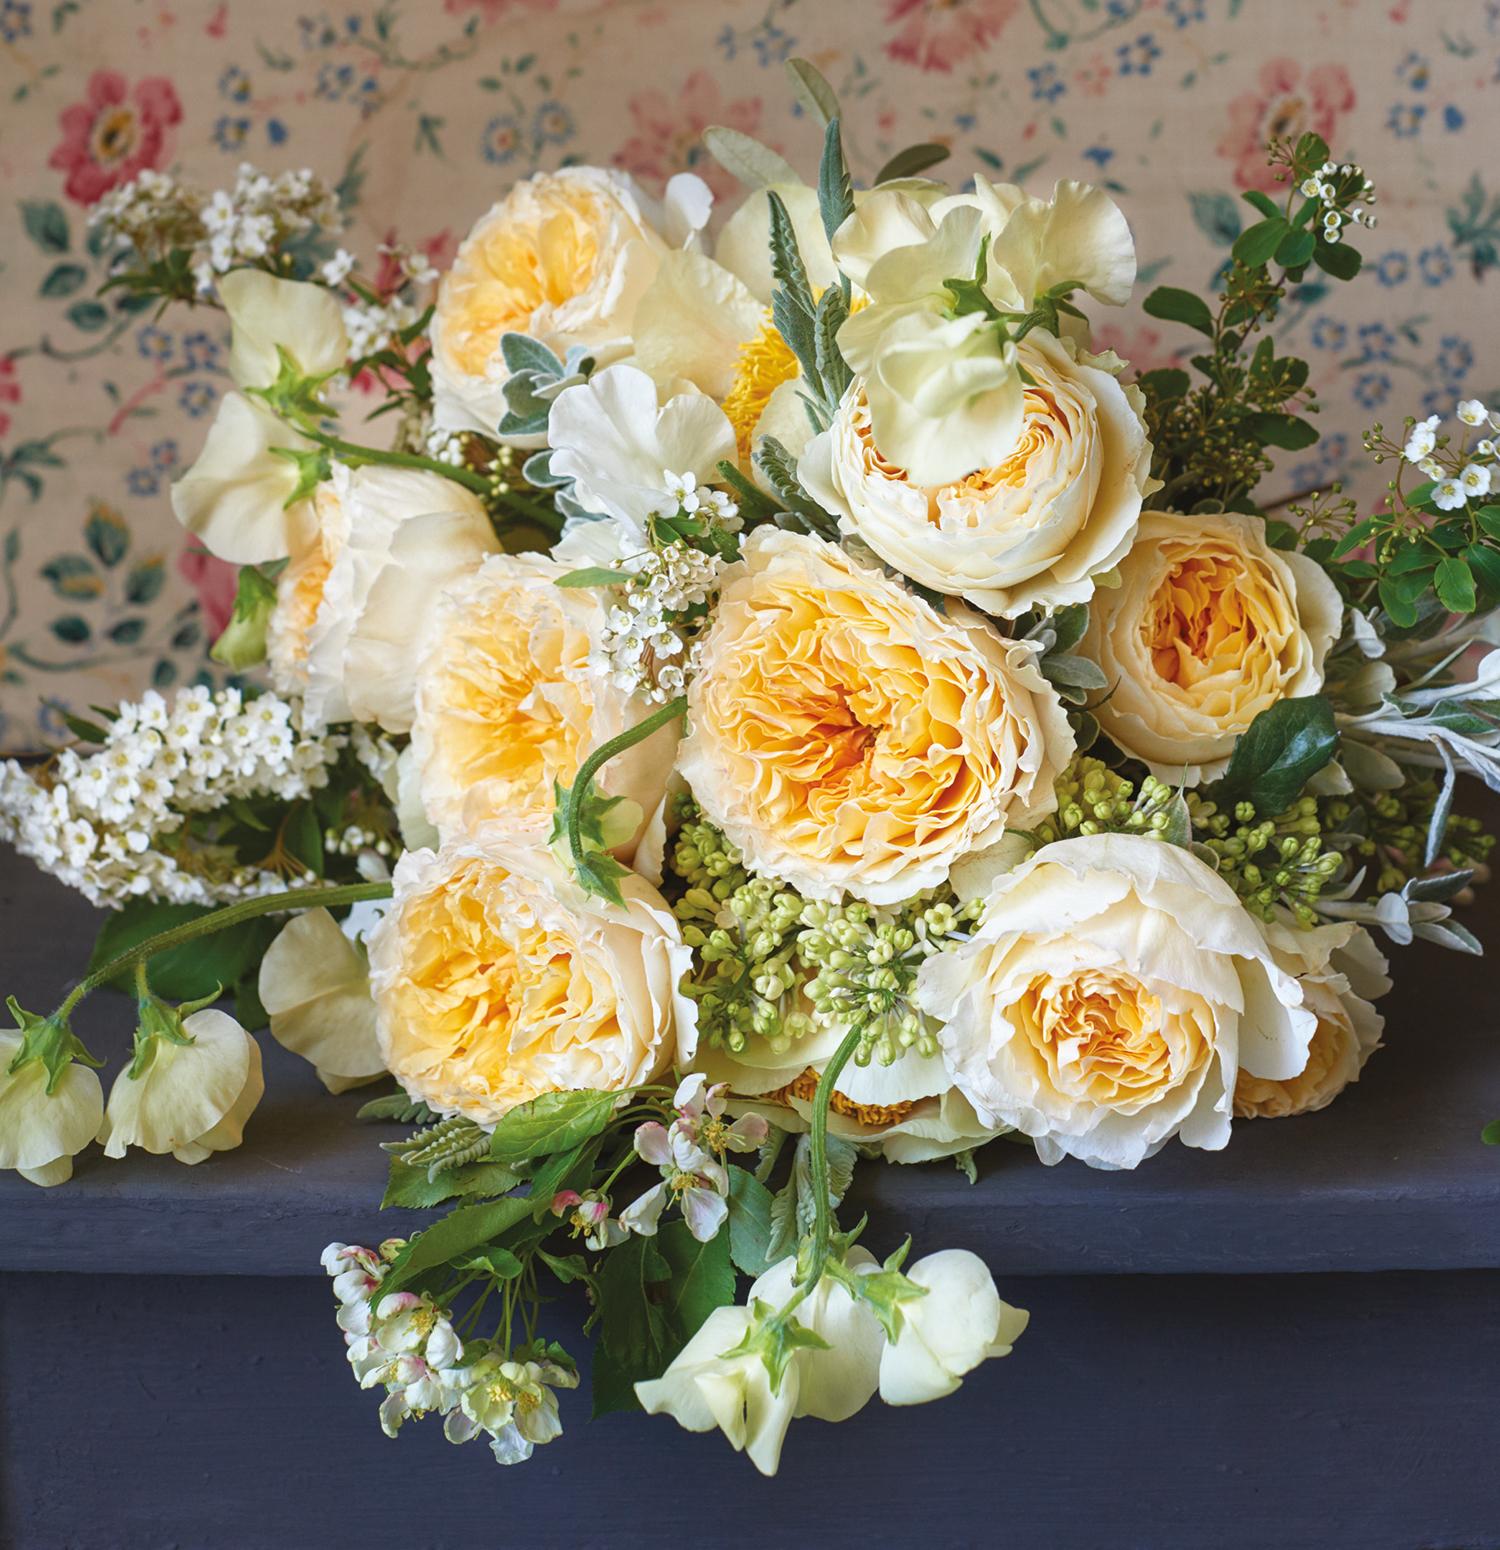 Beatrice rose wedding bouquet design